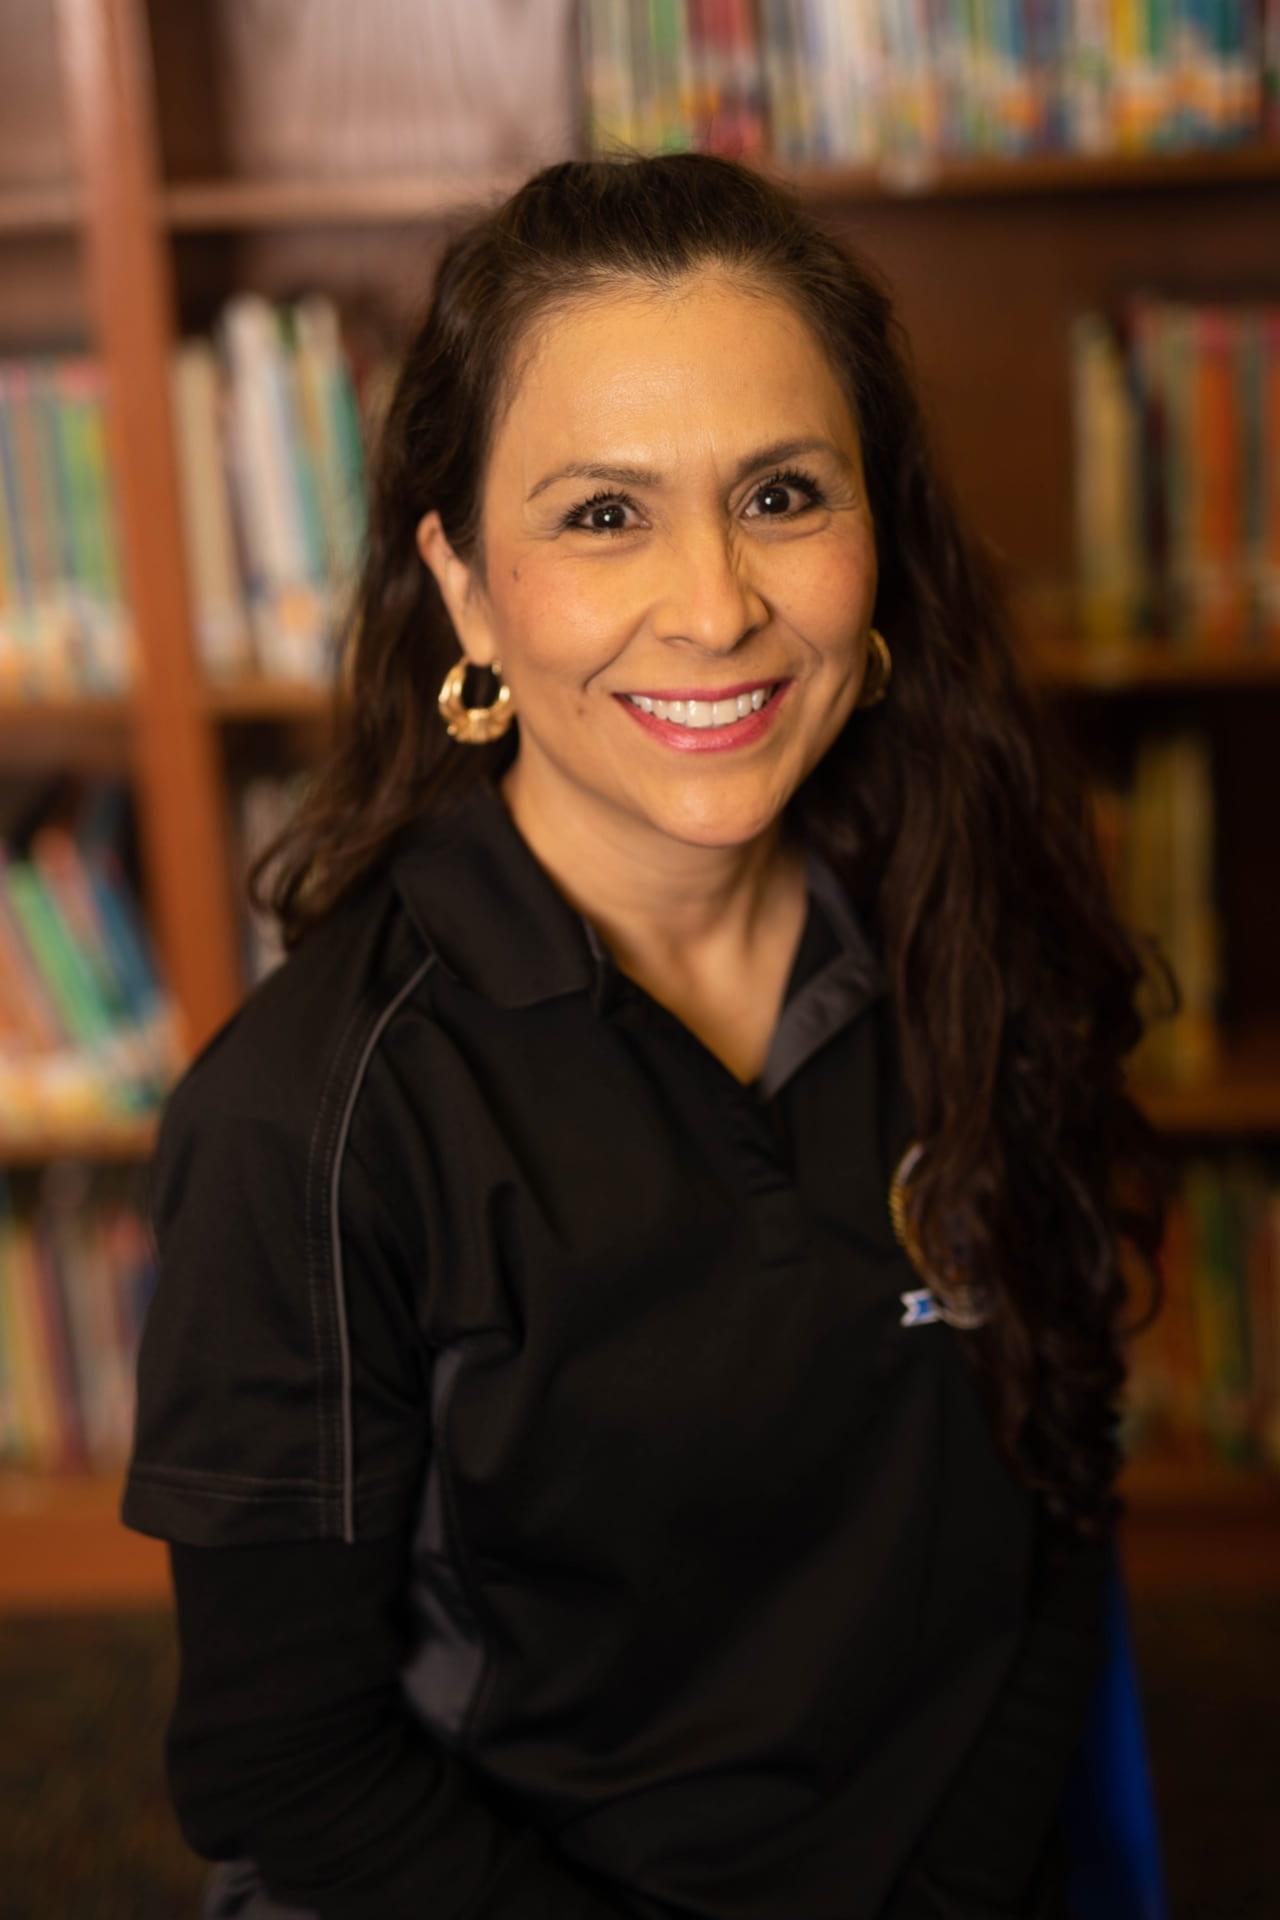 Marina Escobedo